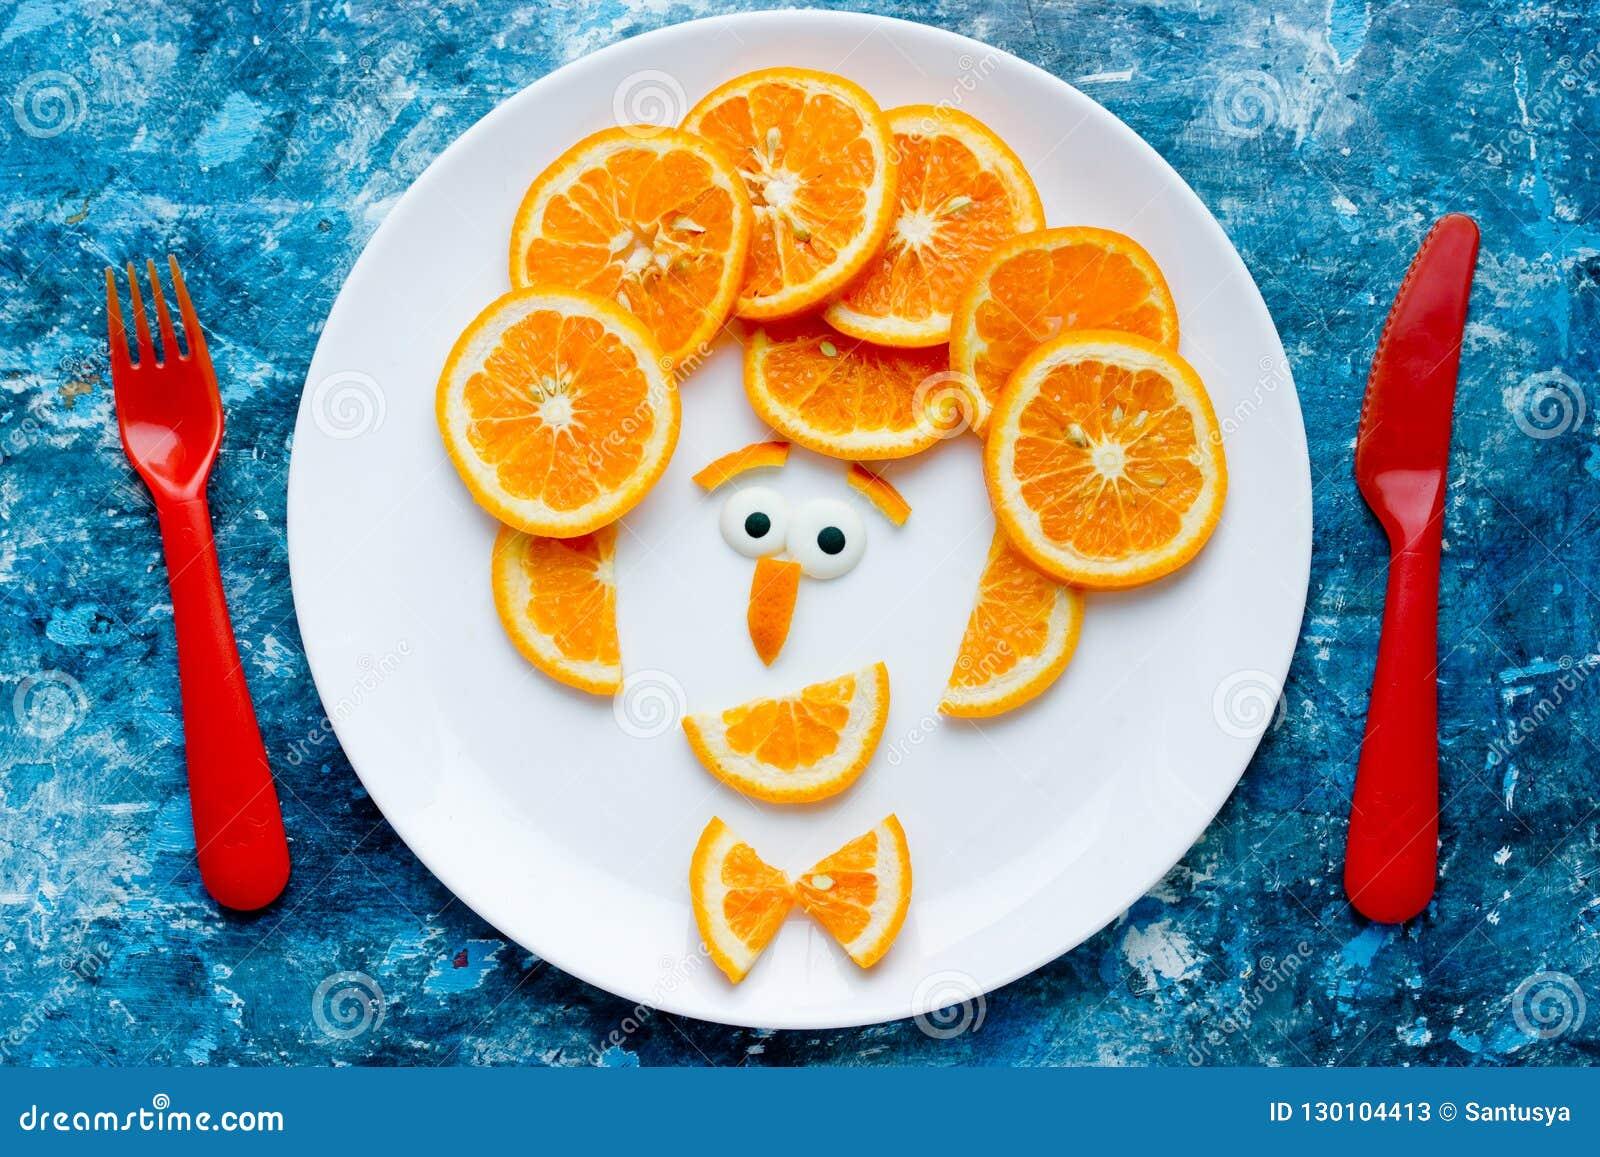 Funny Man Face Fruit Plate Stock Image Image Of Idea 130104413